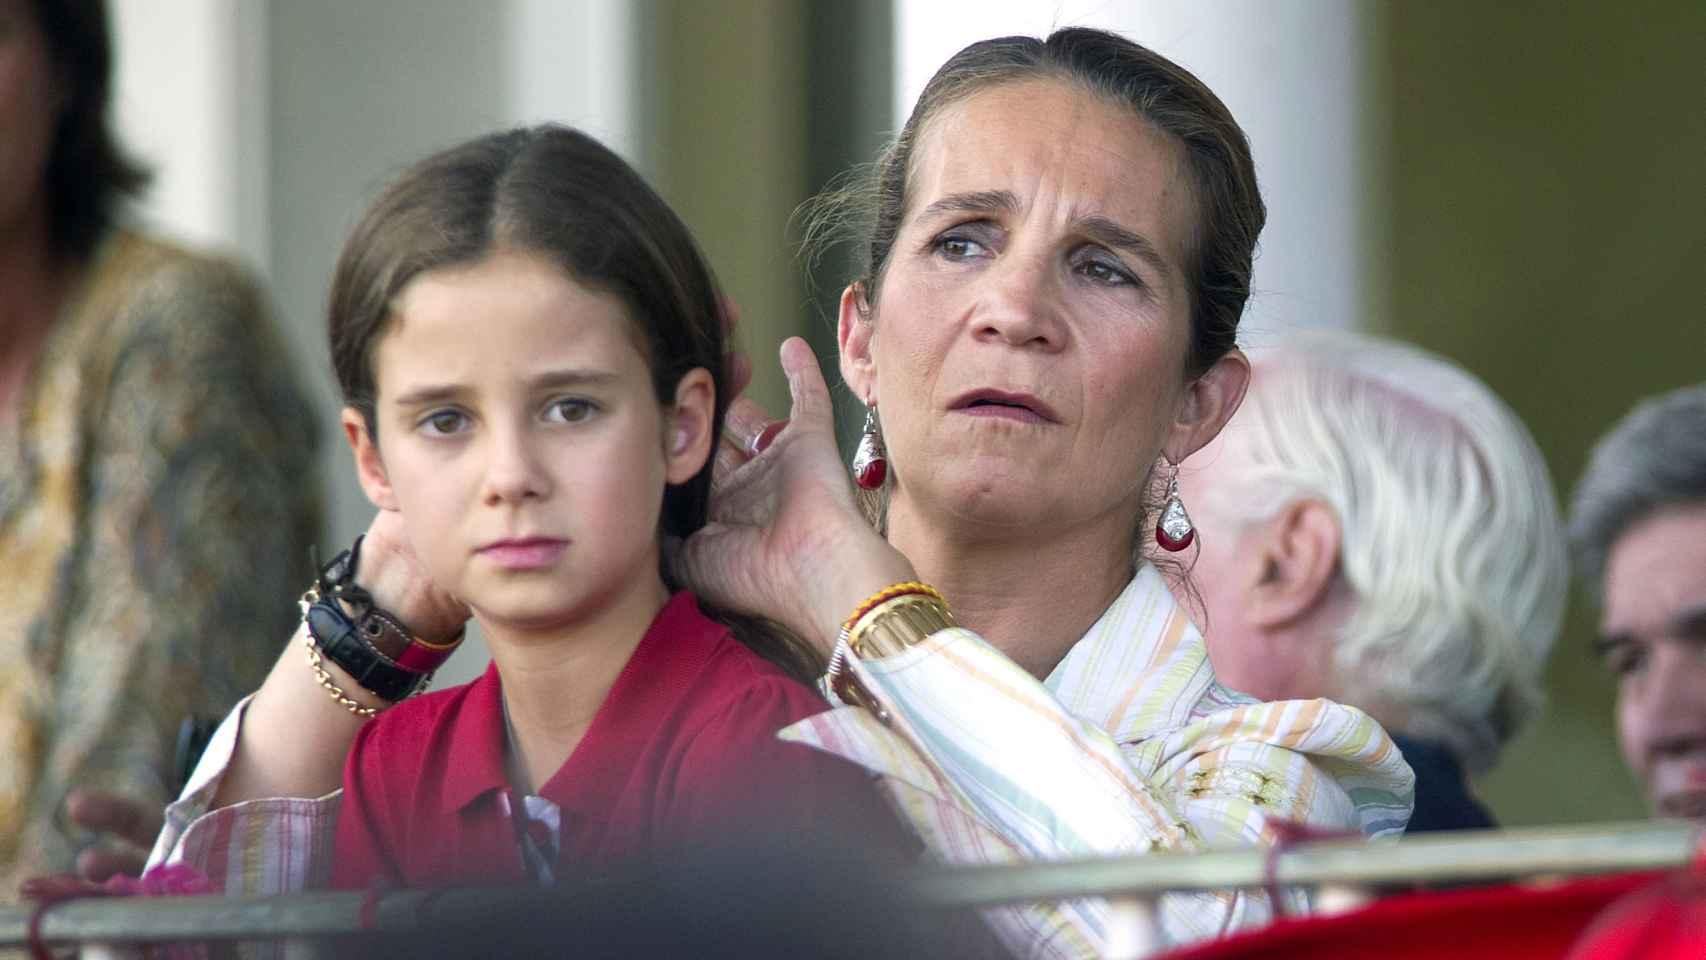 La infanta Elena recoge cariñosamente la melena de su hija.